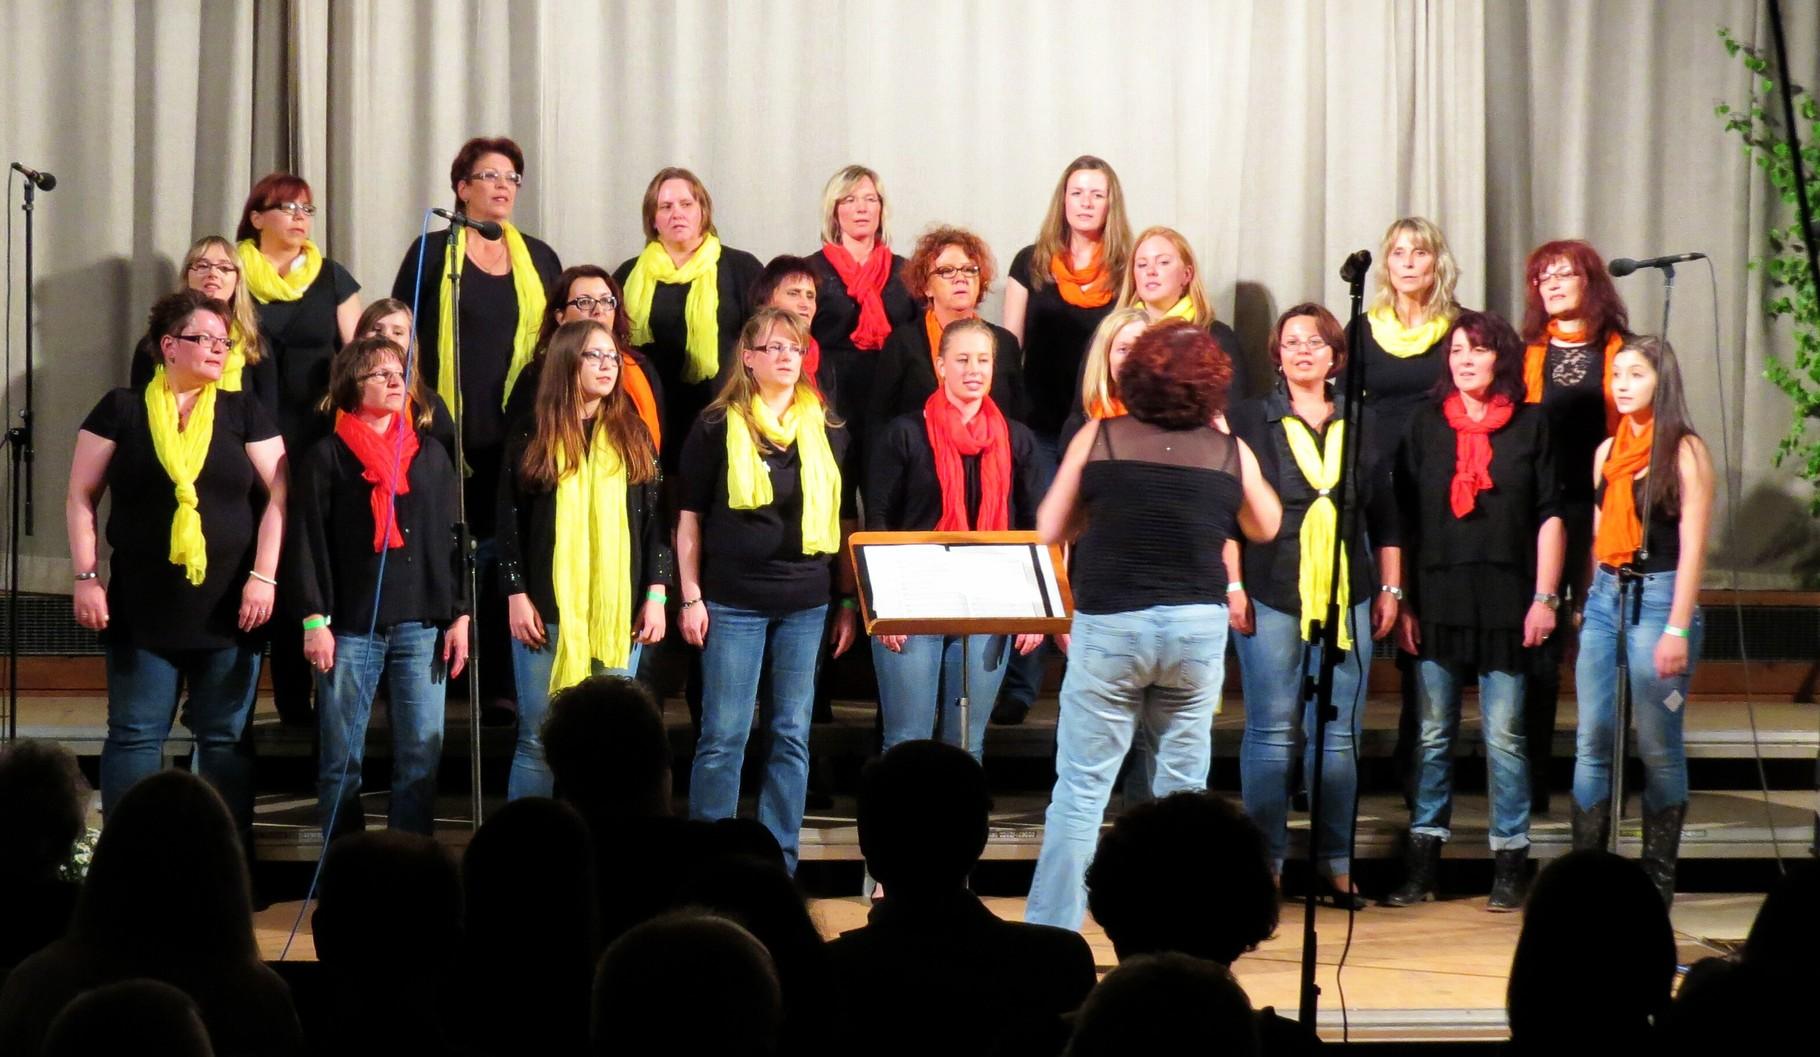 Chorus Company,Ruppertshofen